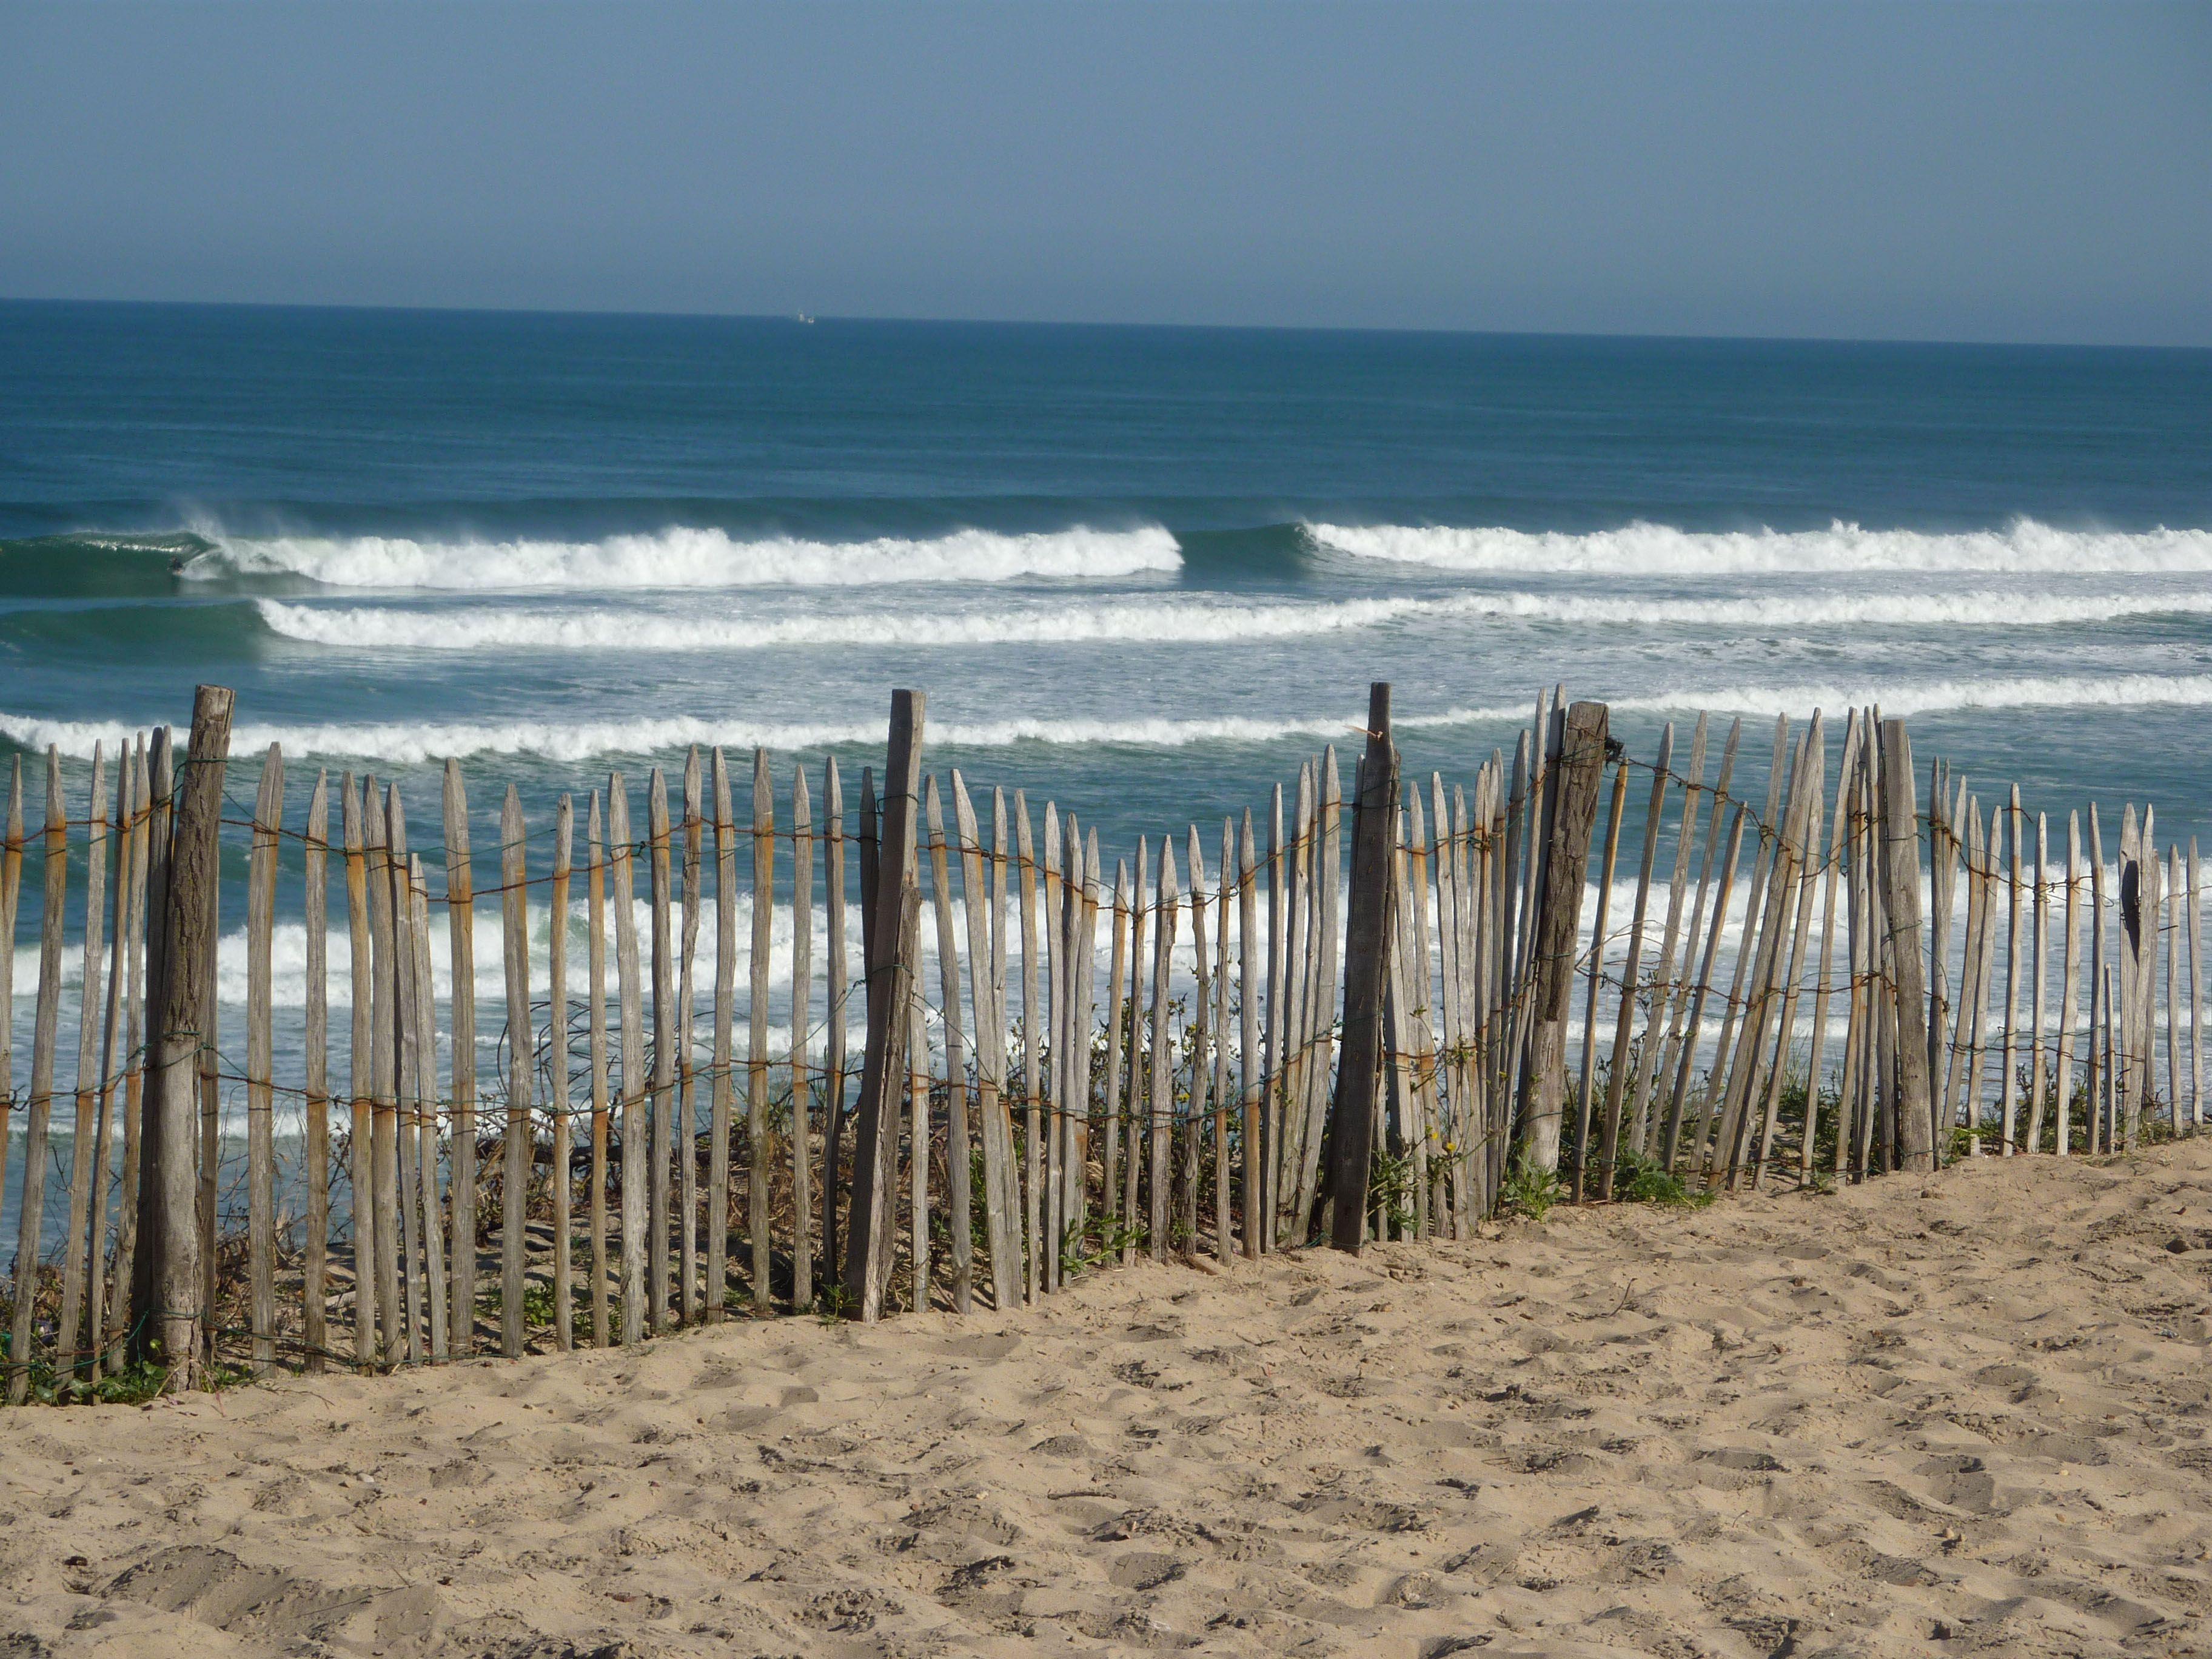 bord de mer et ganivelles landes sea beach plage landes pinterest aquitaine. Black Bedroom Furniture Sets. Home Design Ideas